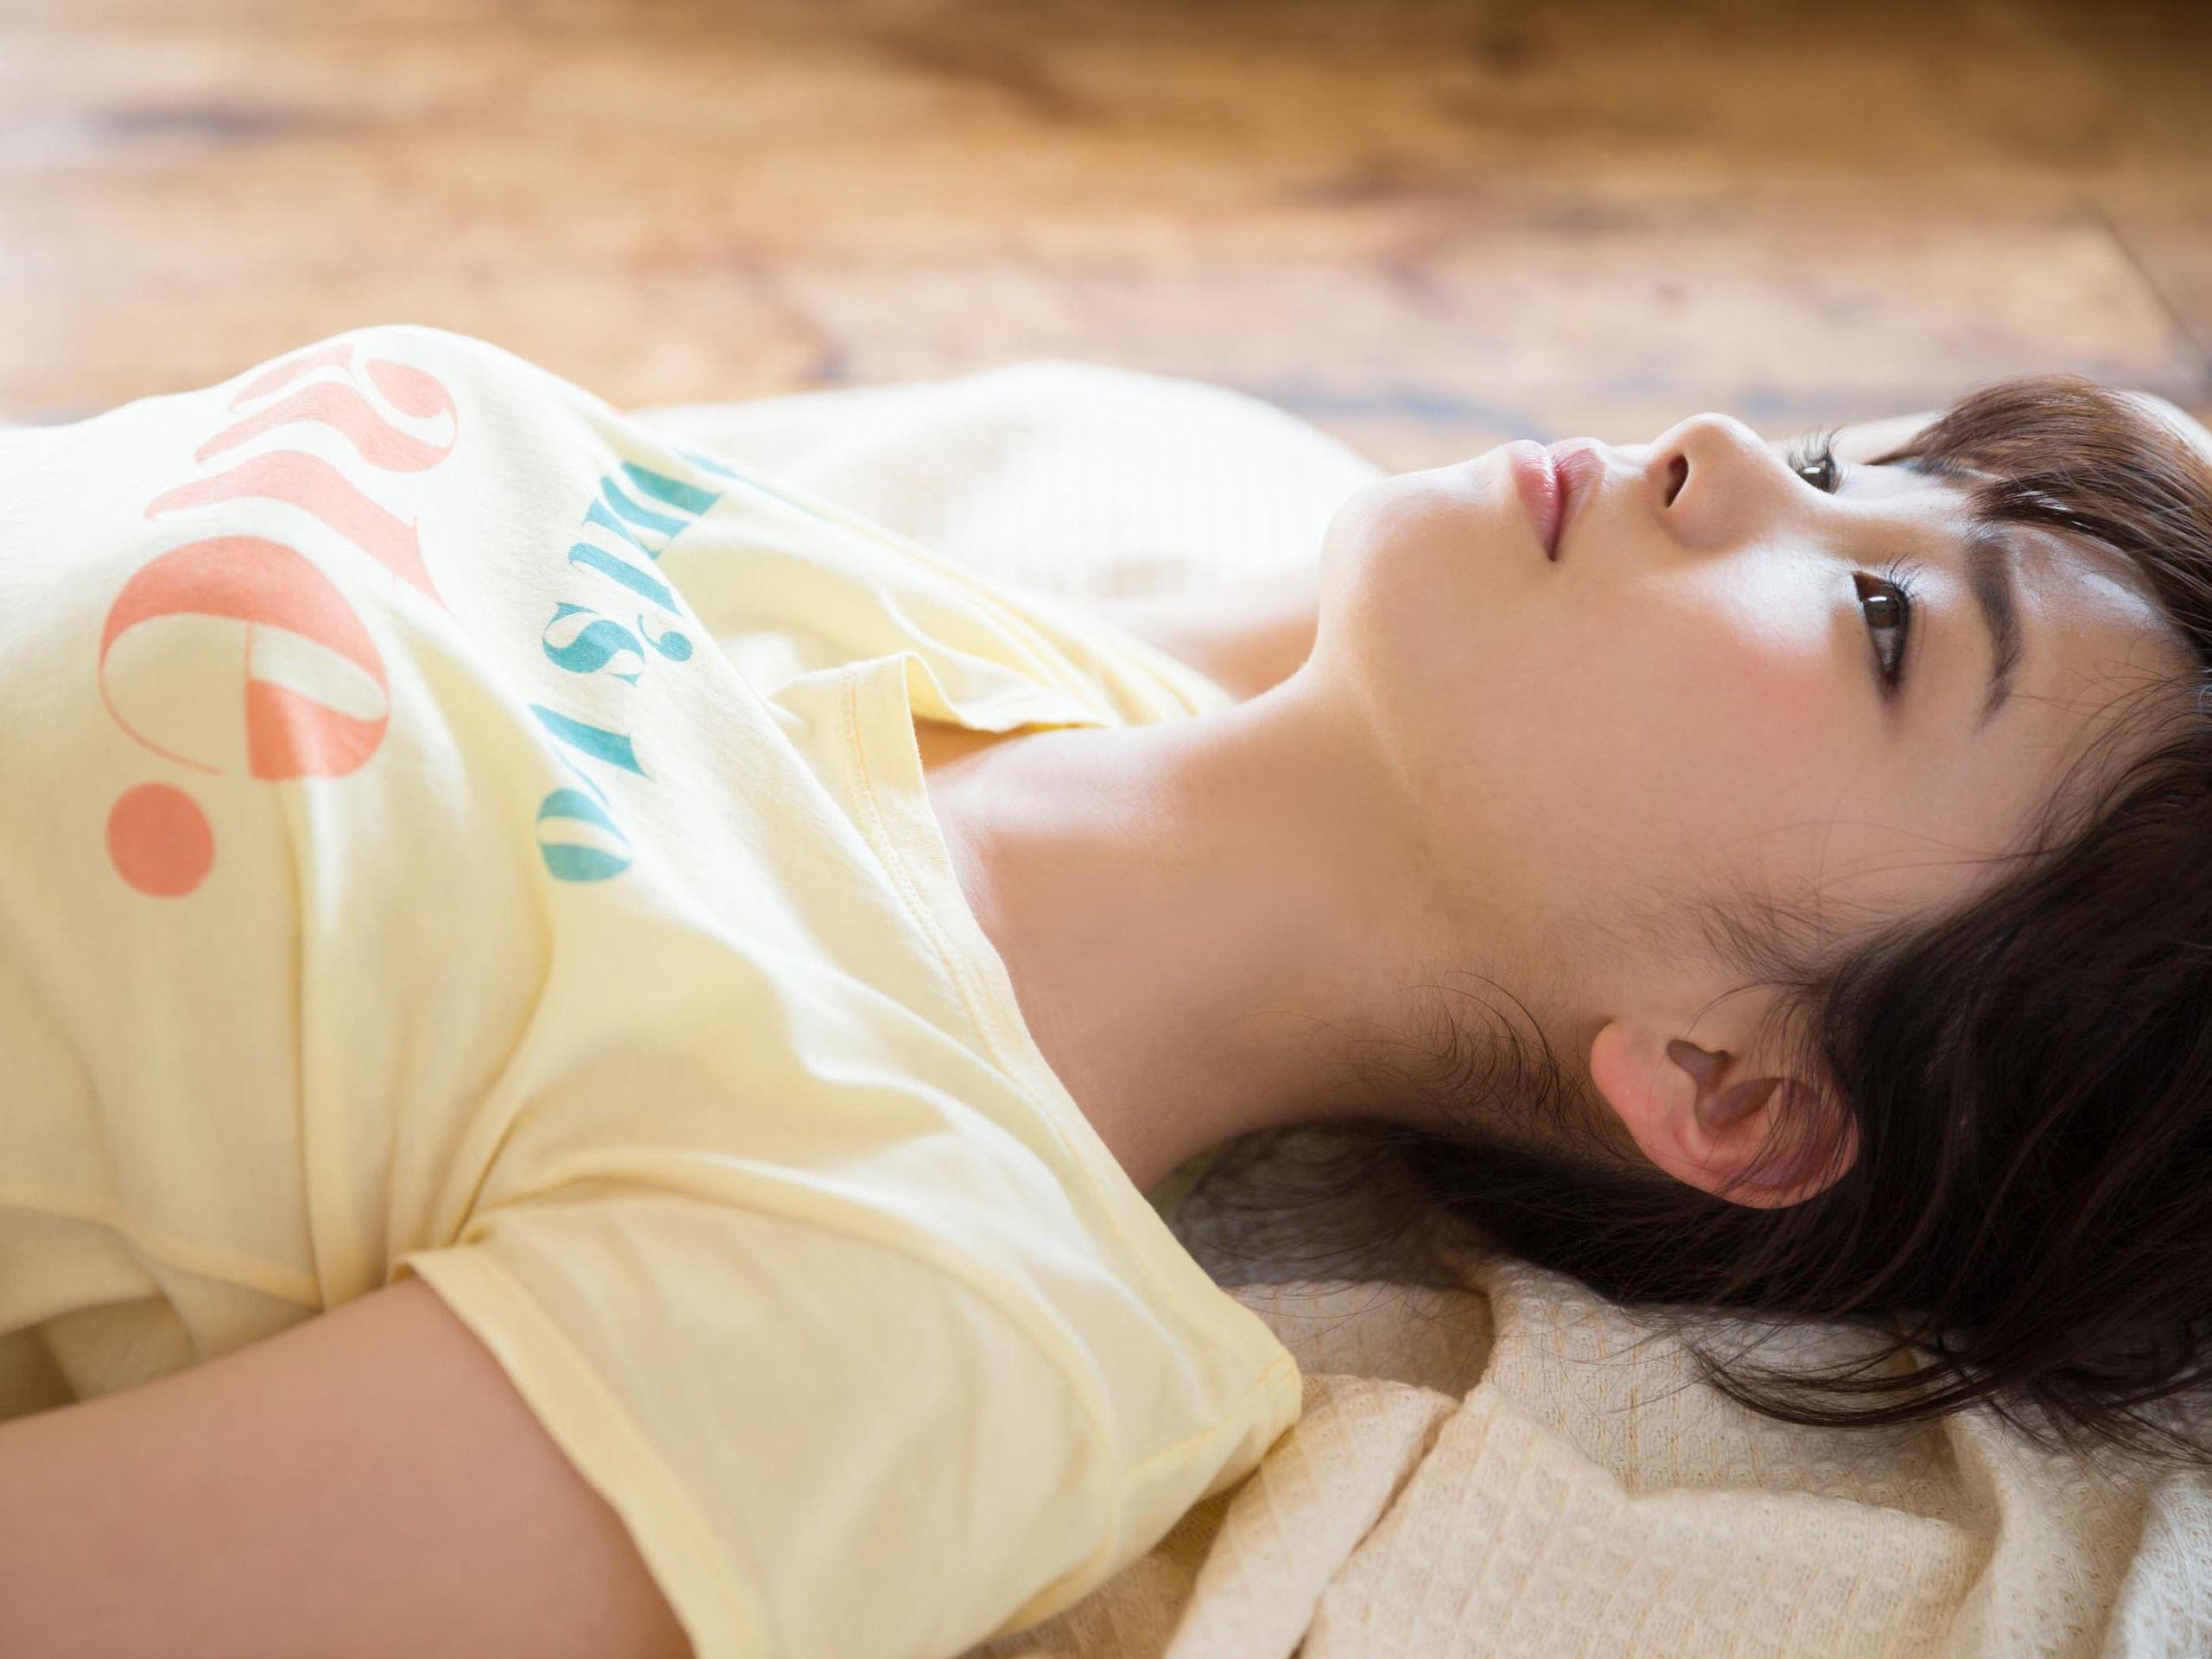 PROTO STAR 飯豊まりえ vol.3 50photos